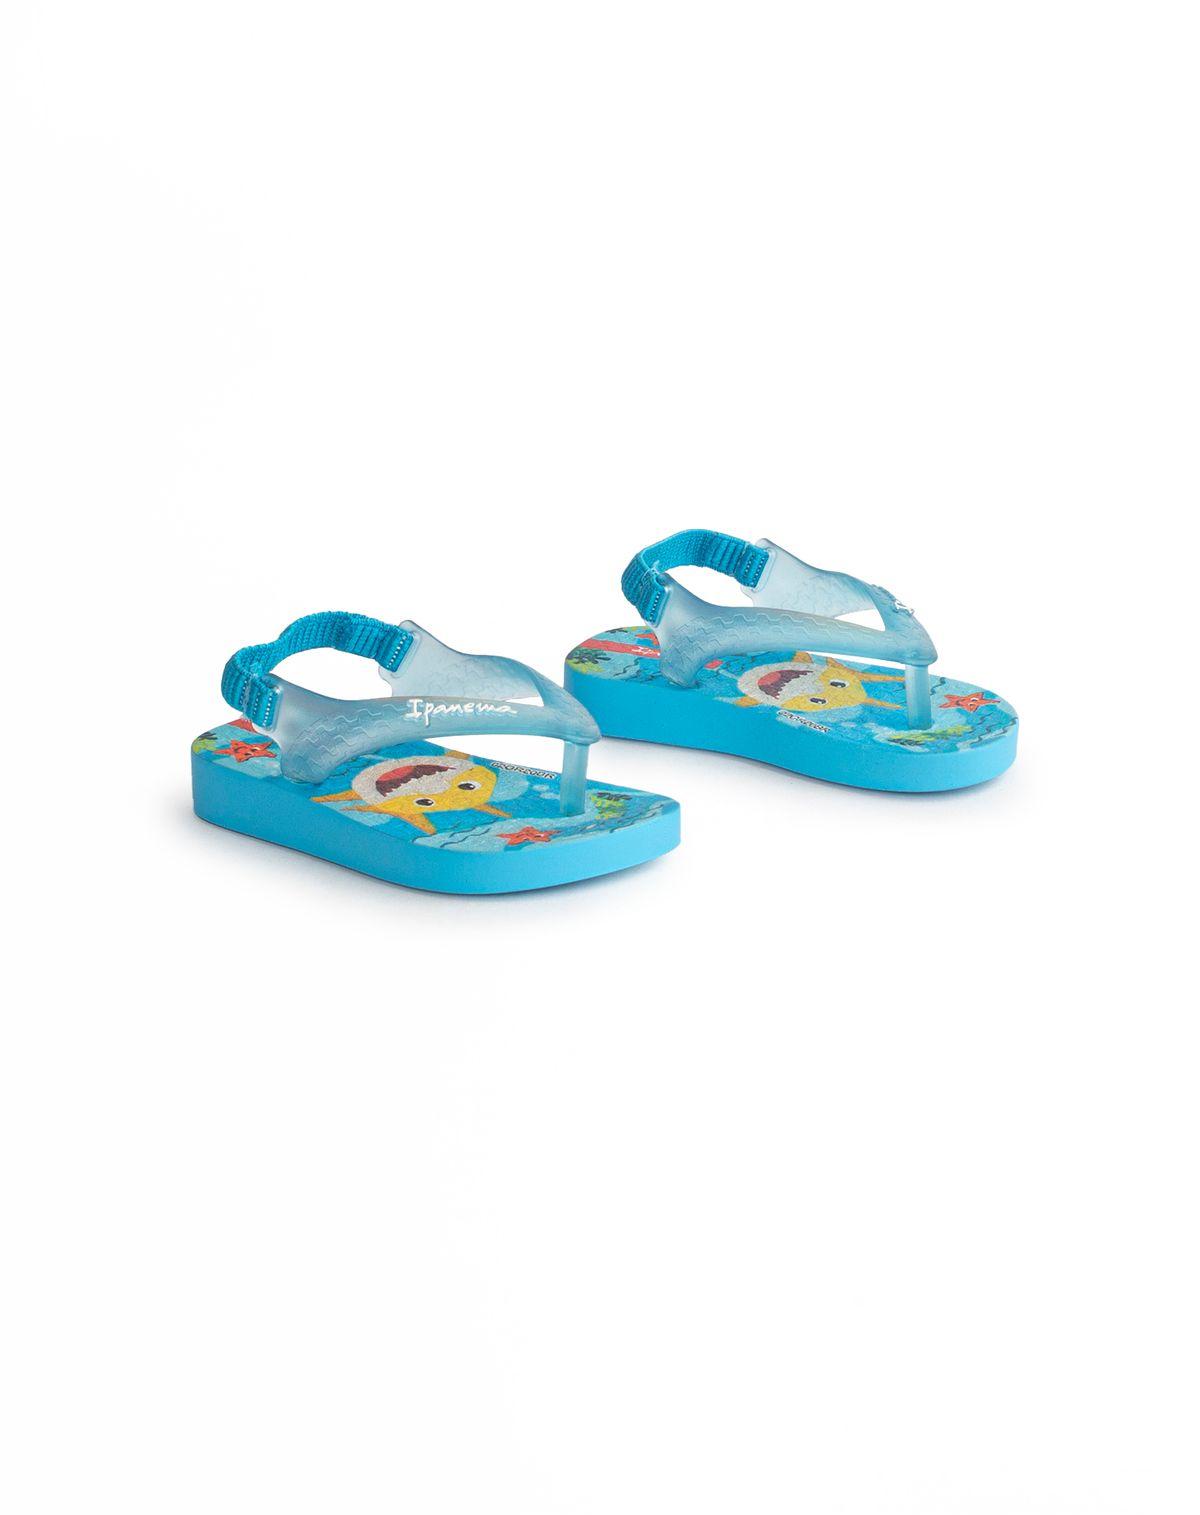 559016002-sandalia-bebe-menino-dedo-ipanema-baby-shark-azul-19-777